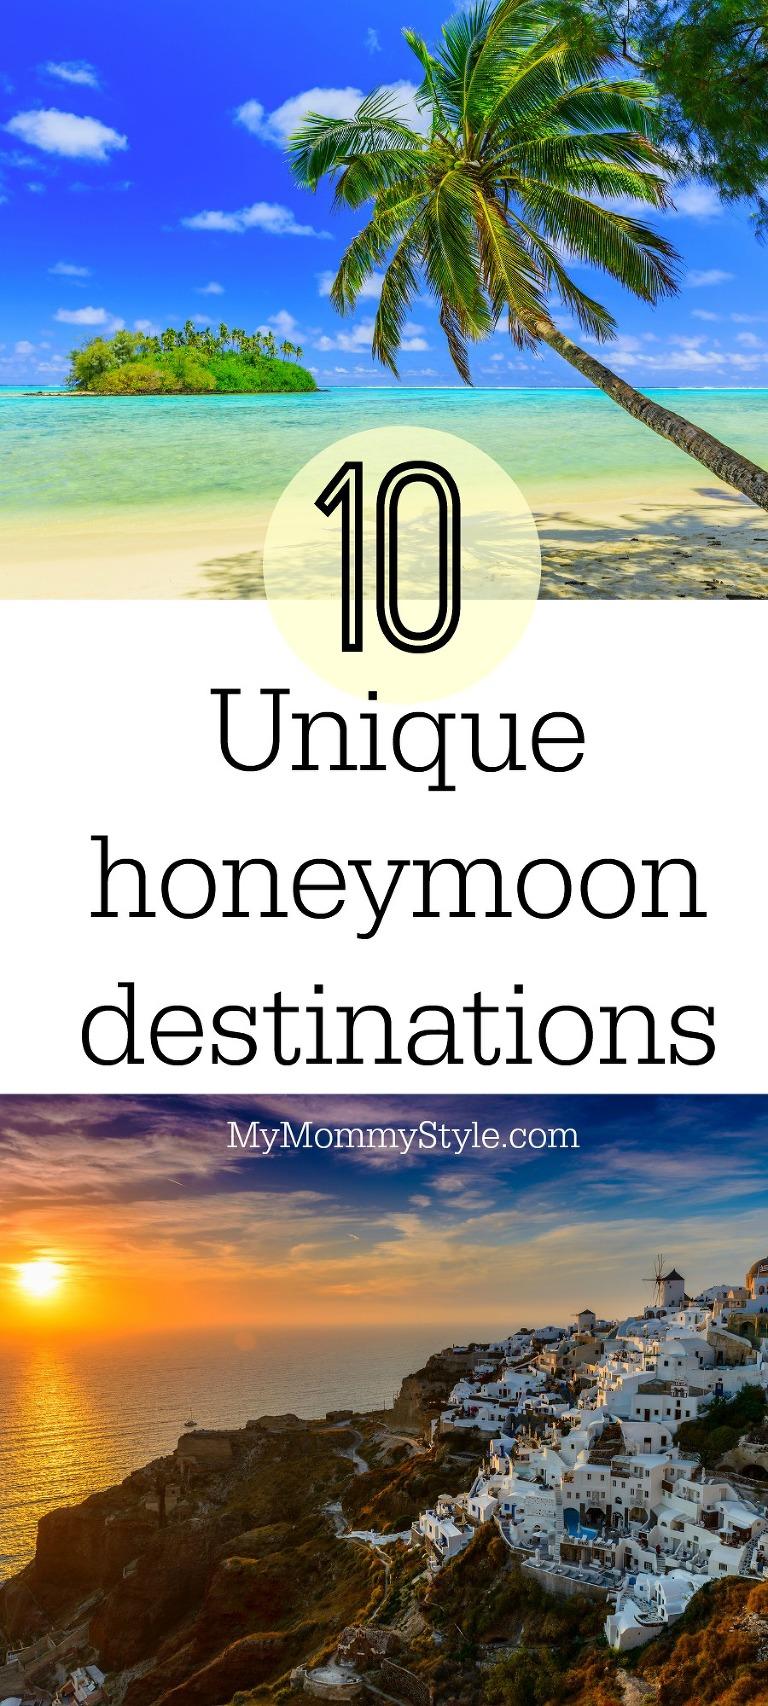 10 unique honeymoon destinations